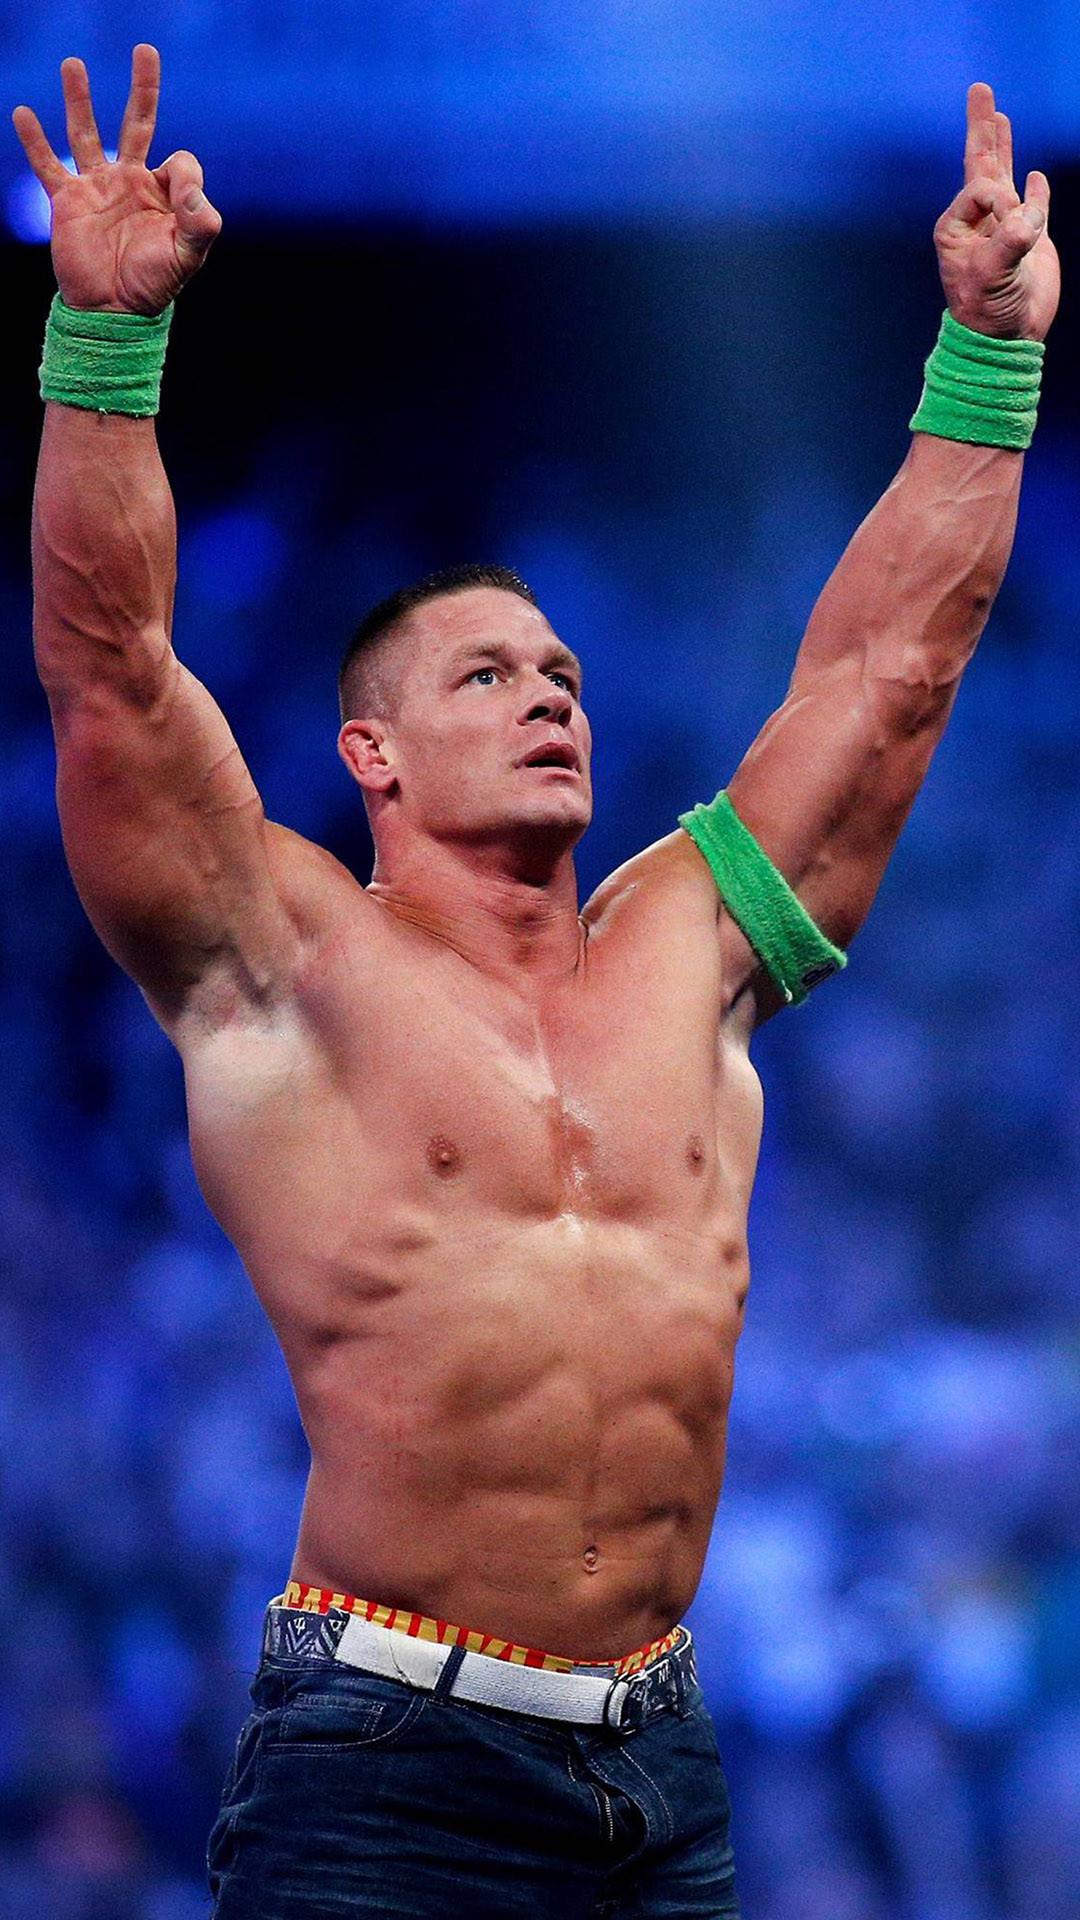 Res: 1080x1920, John Cena Full HD 1080p Images Photos Pics Wallpapers startwallpapers. Â«Â«